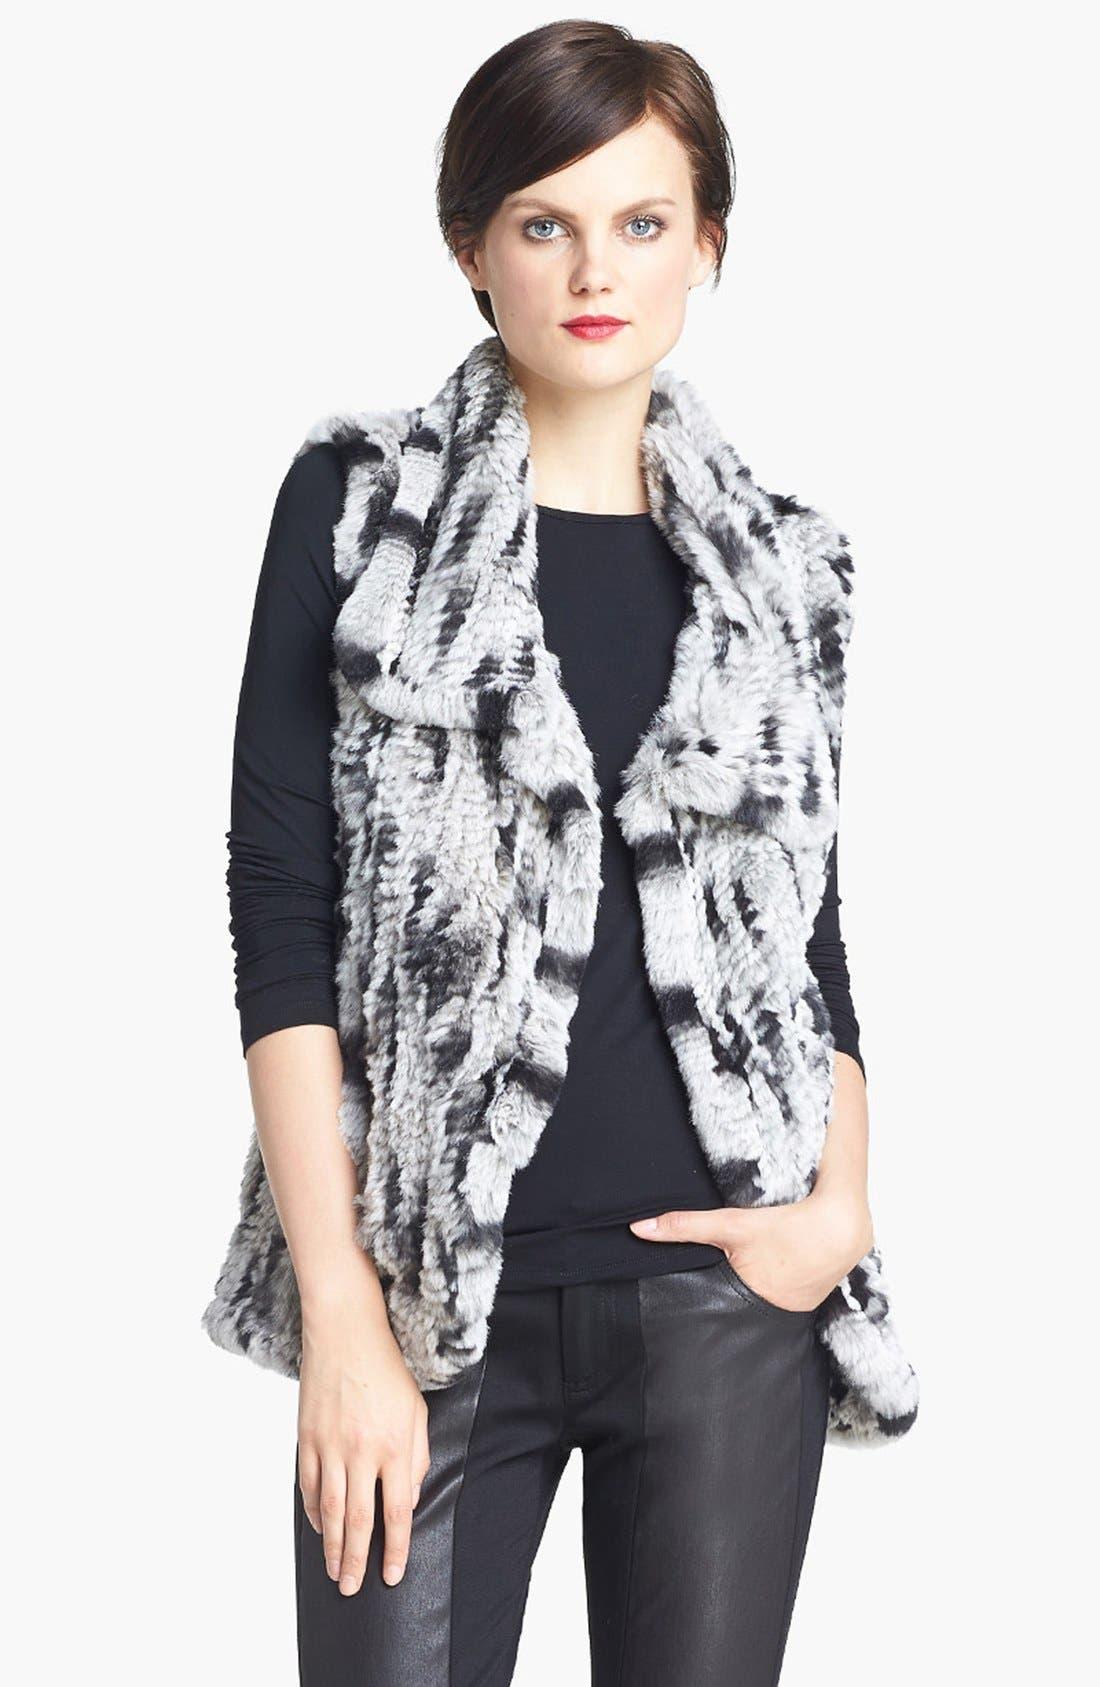 Alternate Image 1 Selected - Alice + Olivia 'Celine' Sleeveless Genuine Rabbit Fur Vest